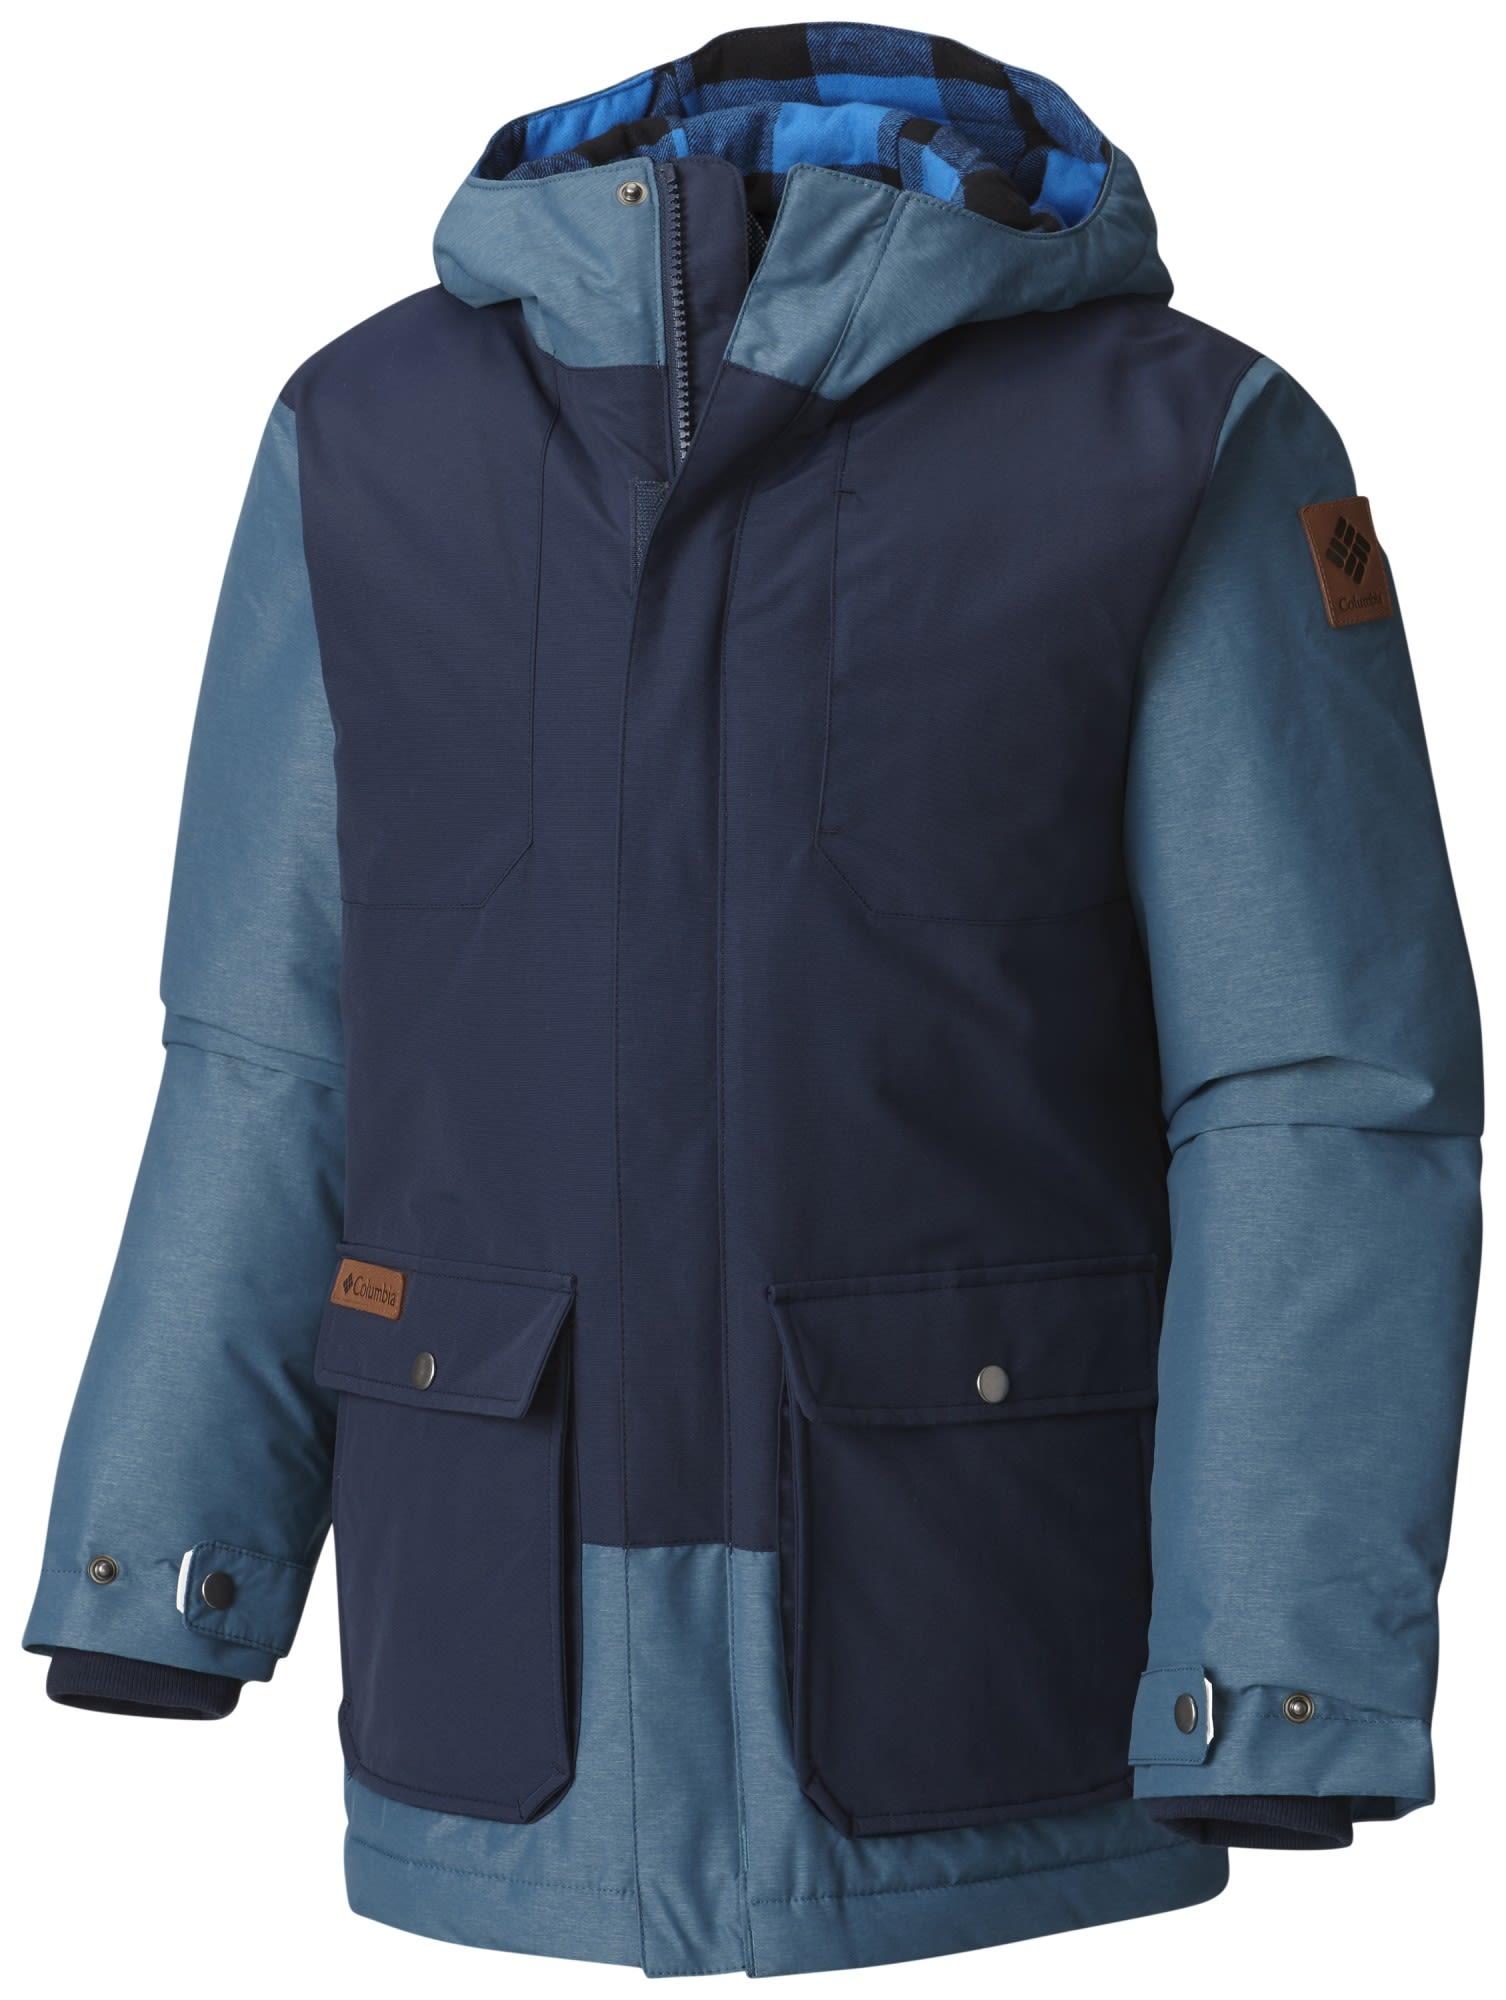 Columbia Boys Lost Brook Jacket Blau, Male Freizeitjacke, M